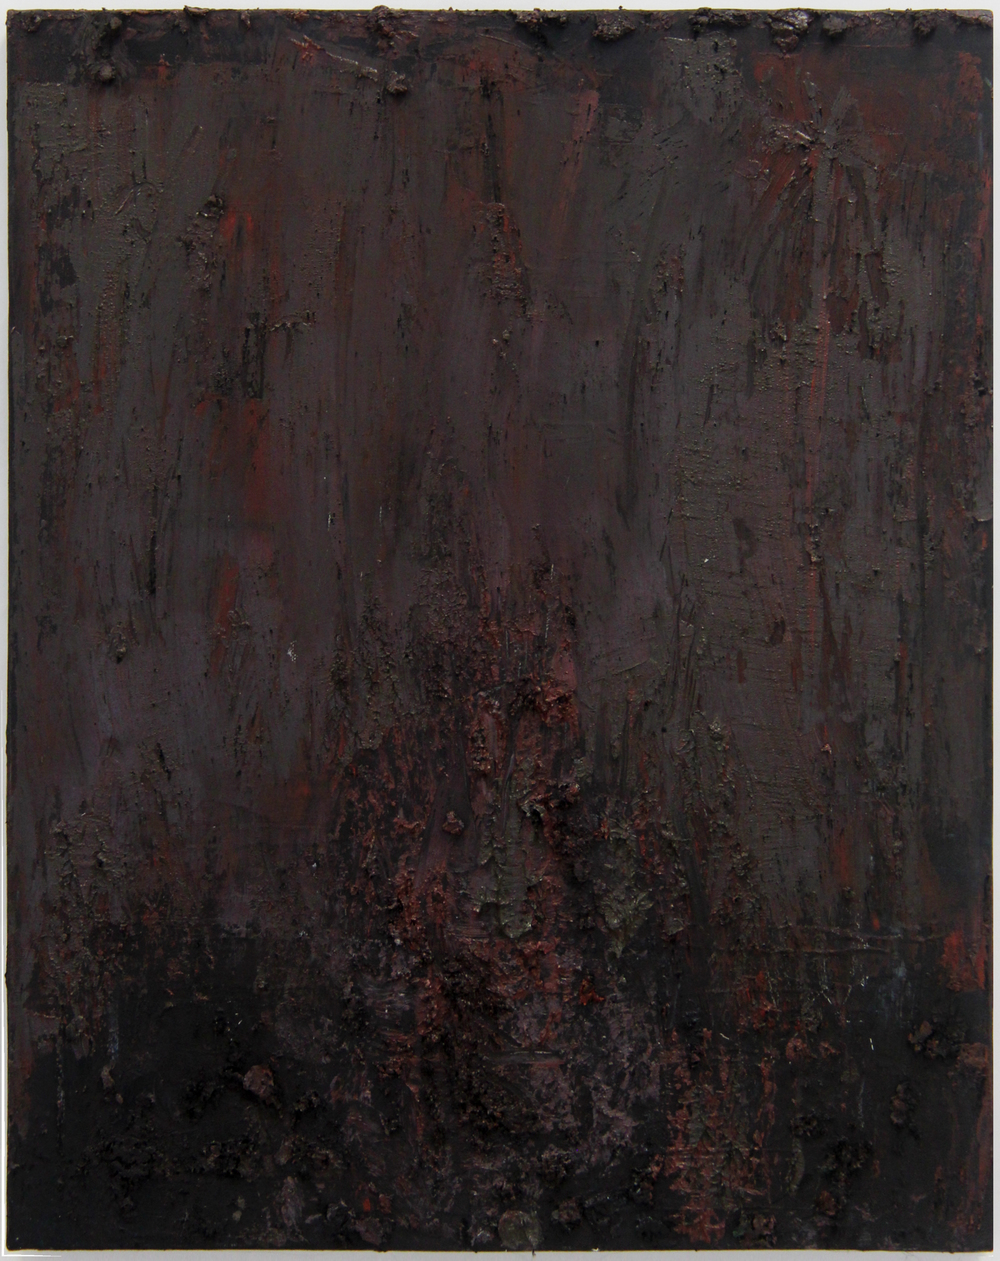 Junior_Paintings_Fall_Finals_4_1.jpg